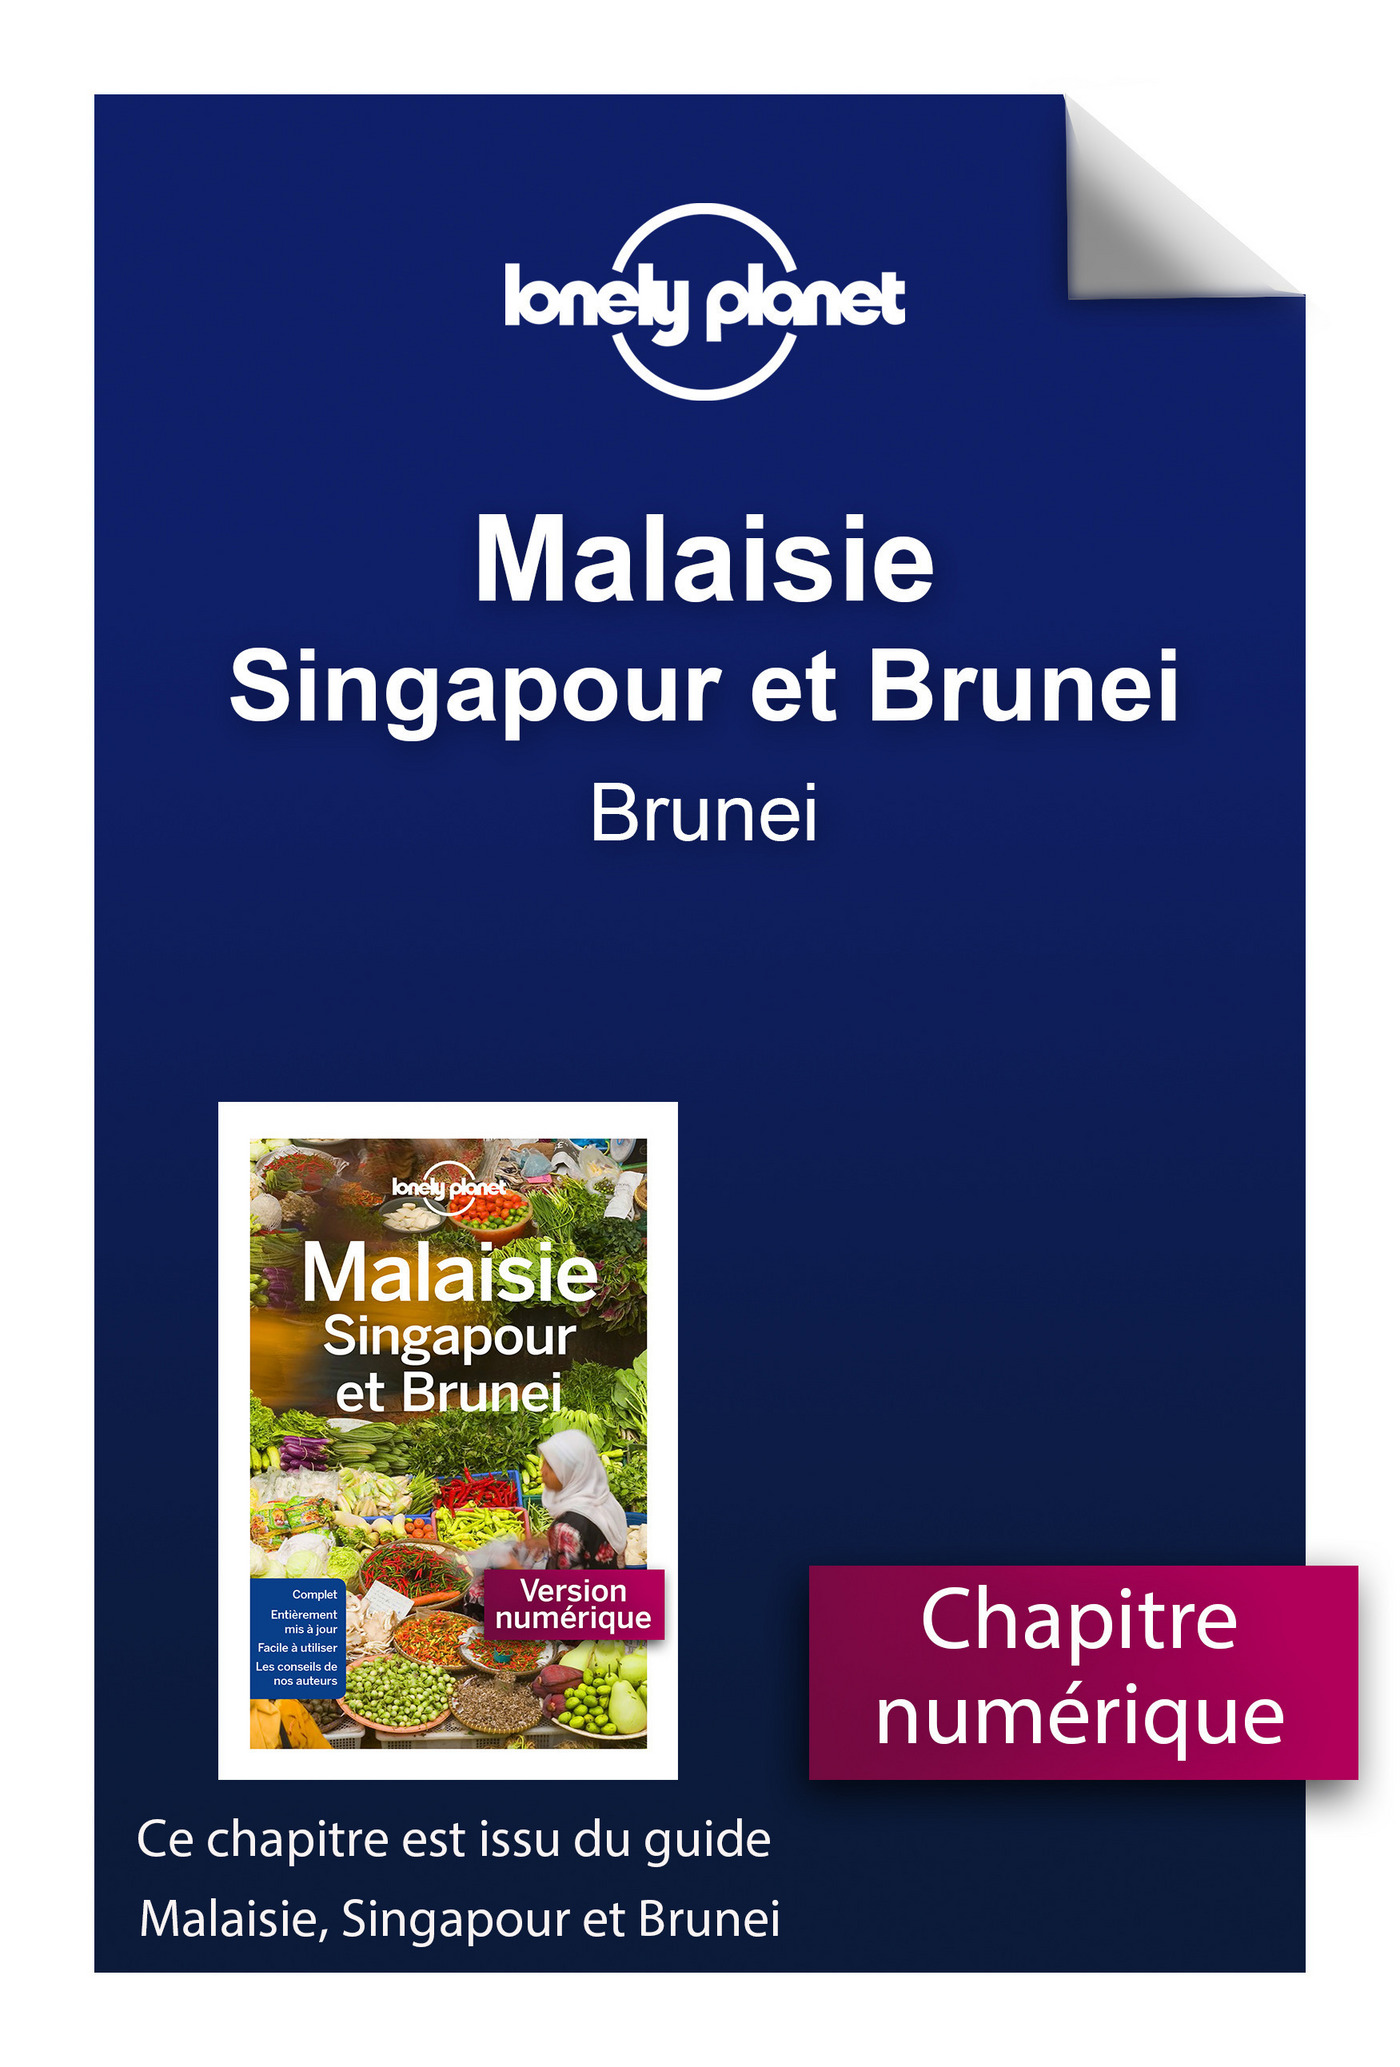 Malaisie, Singapour et Brunei - Brunei